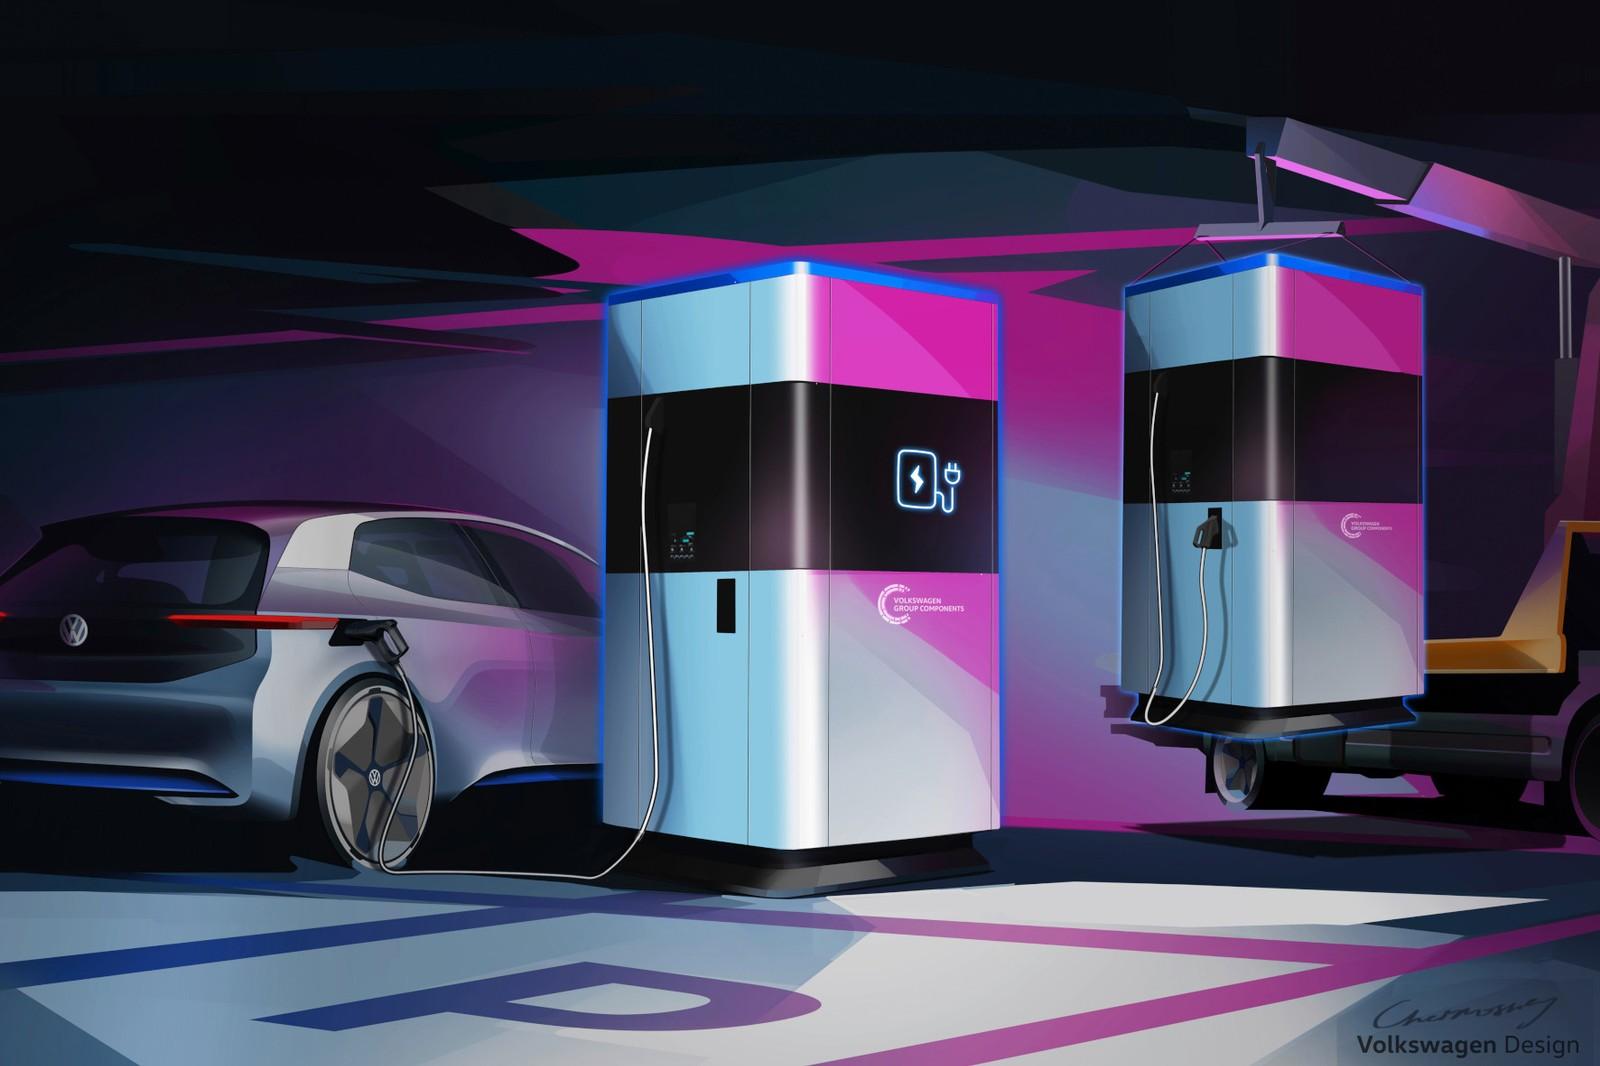 volkswagen baut powerbank ab 2020 in hannover in serie. Black Bedroom Furniture Sets. Home Design Ideas